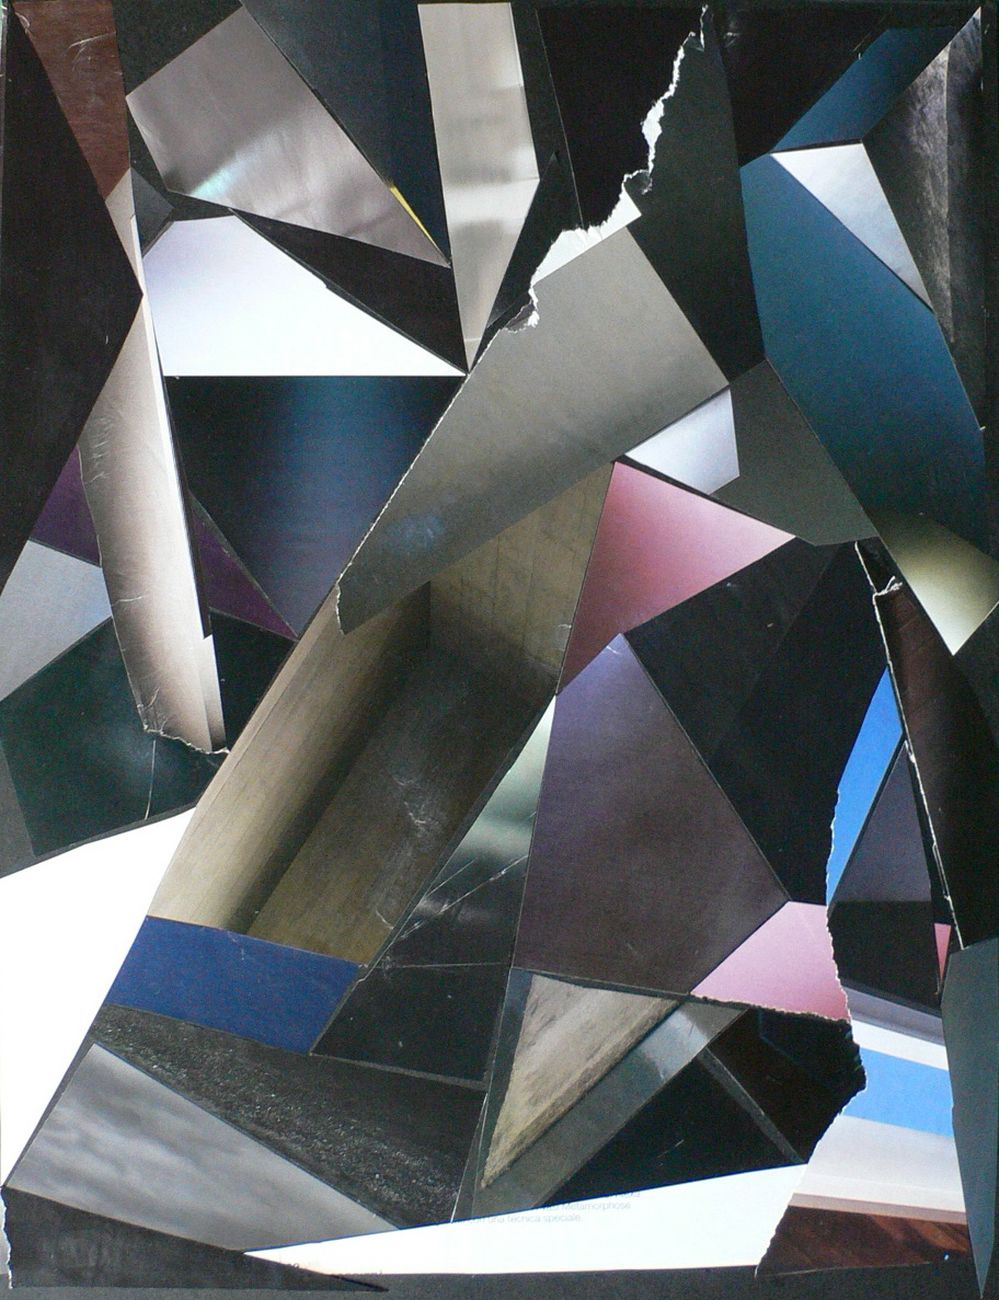 Stanislao Di Giugno, Untitled, 2010, magazine paper on cardboard, 40x30 cm framed